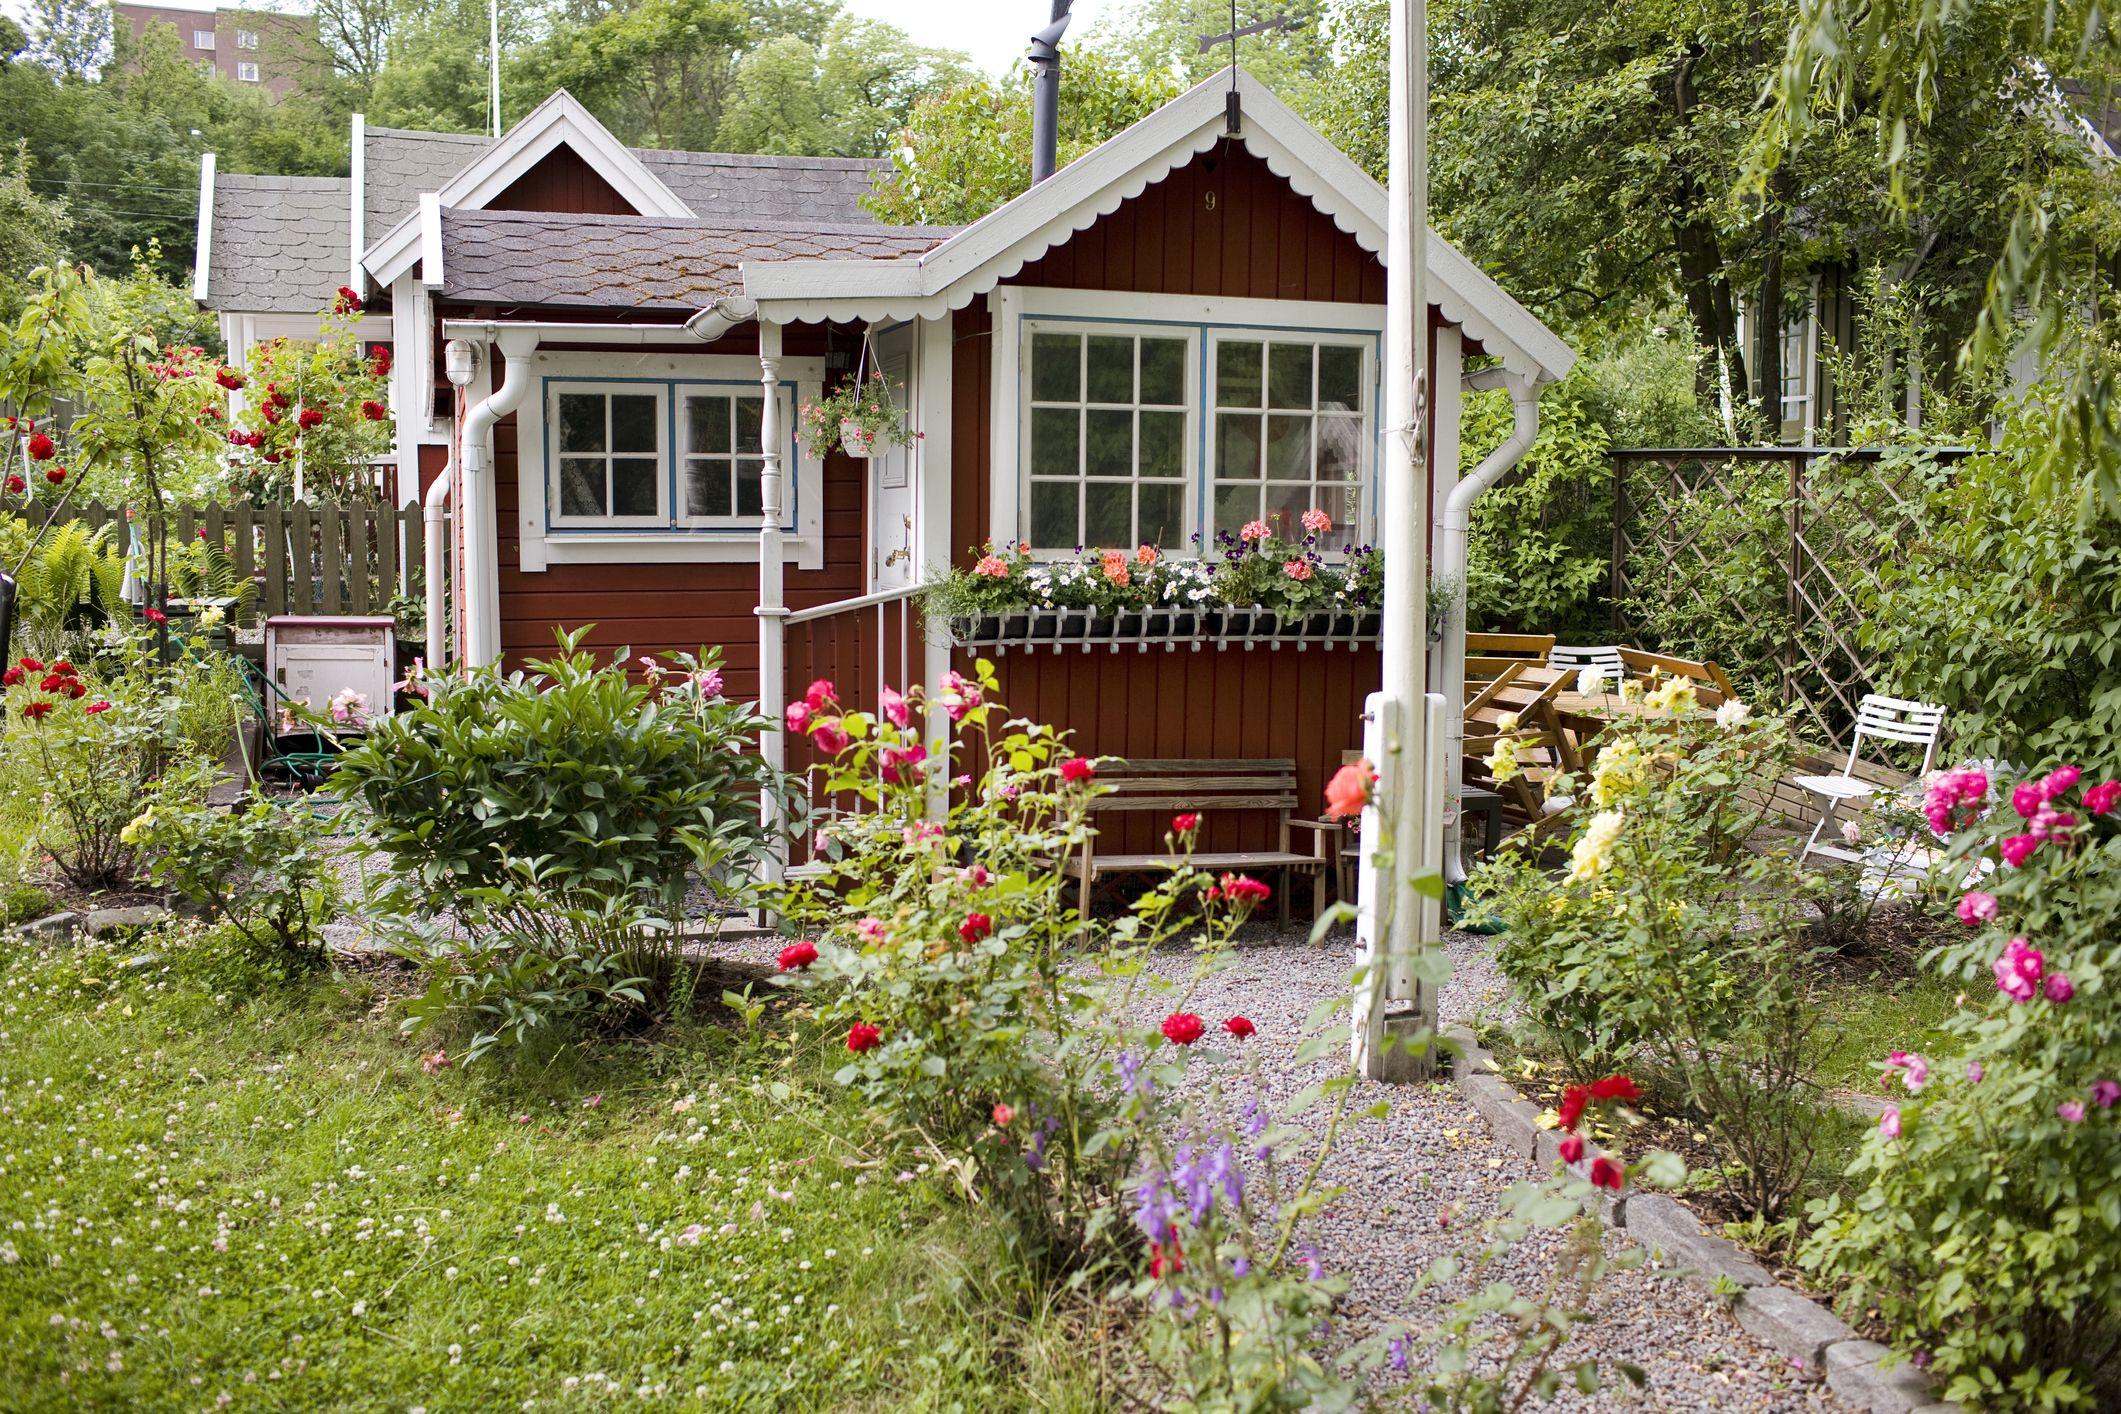 28 Small Backyard Ideas - Beautiful Landscaping Designs ... on Cute Small Backyard Ideas id=52610